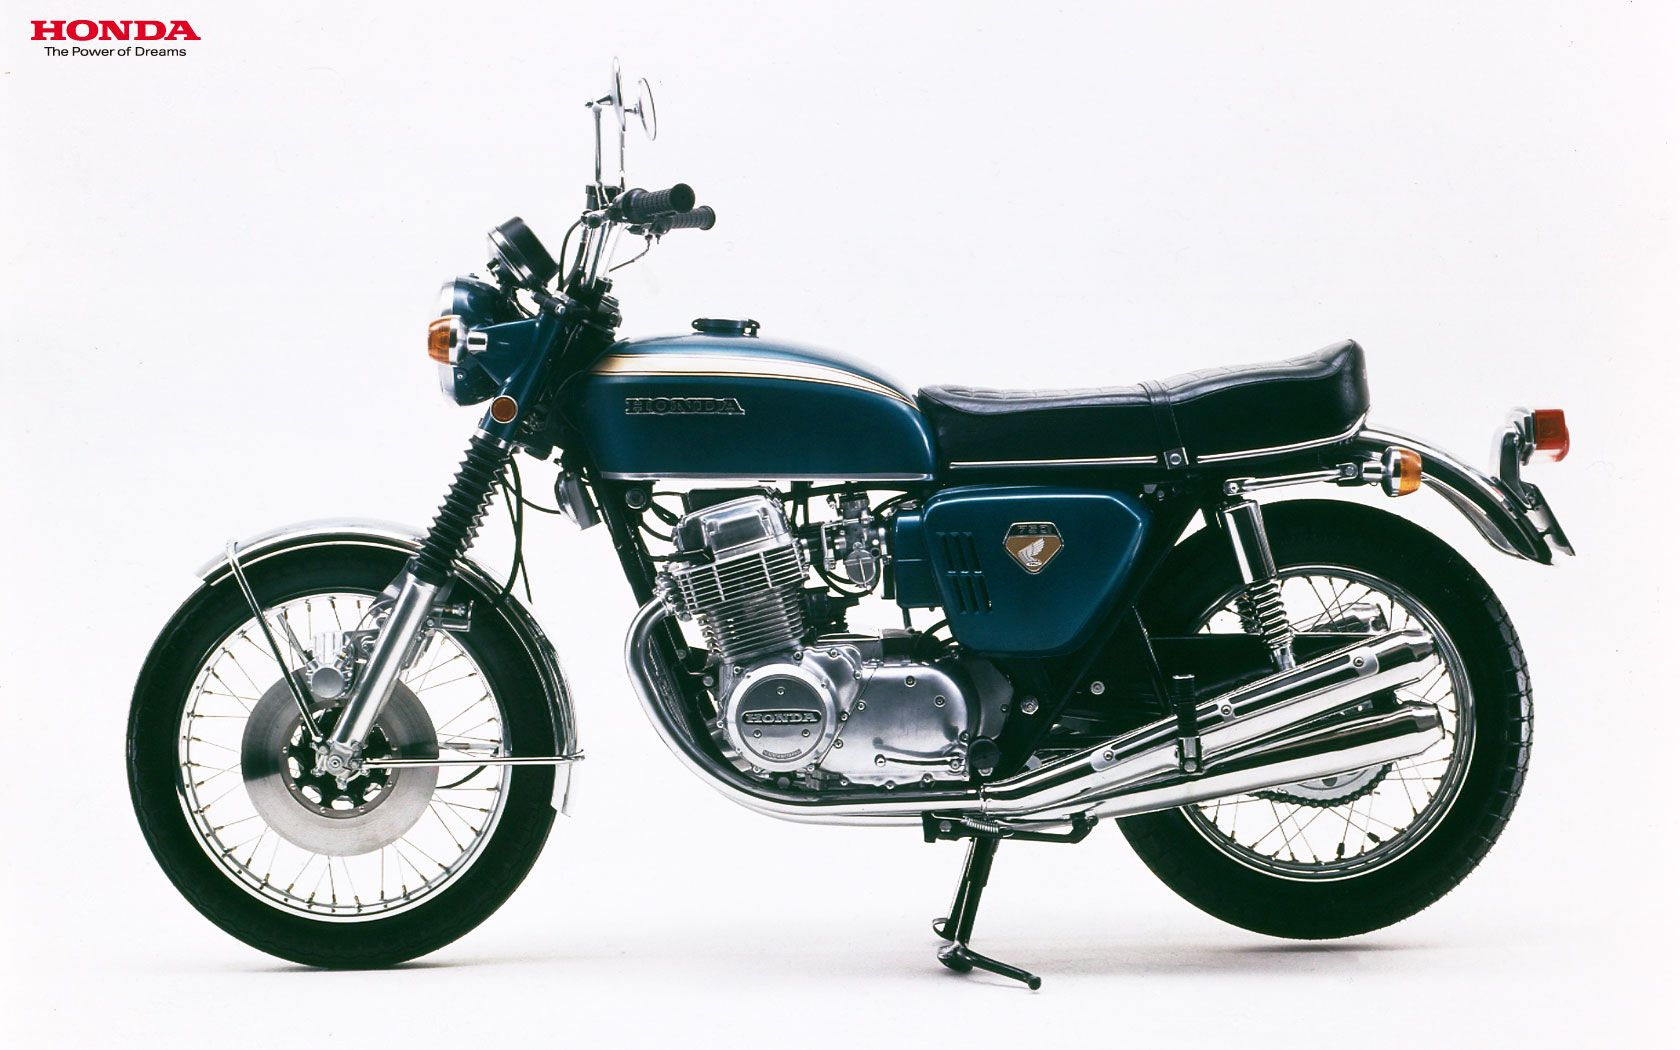 Honda Cb750 Four Vintage Japanese Motorcycles Pinterest Honda